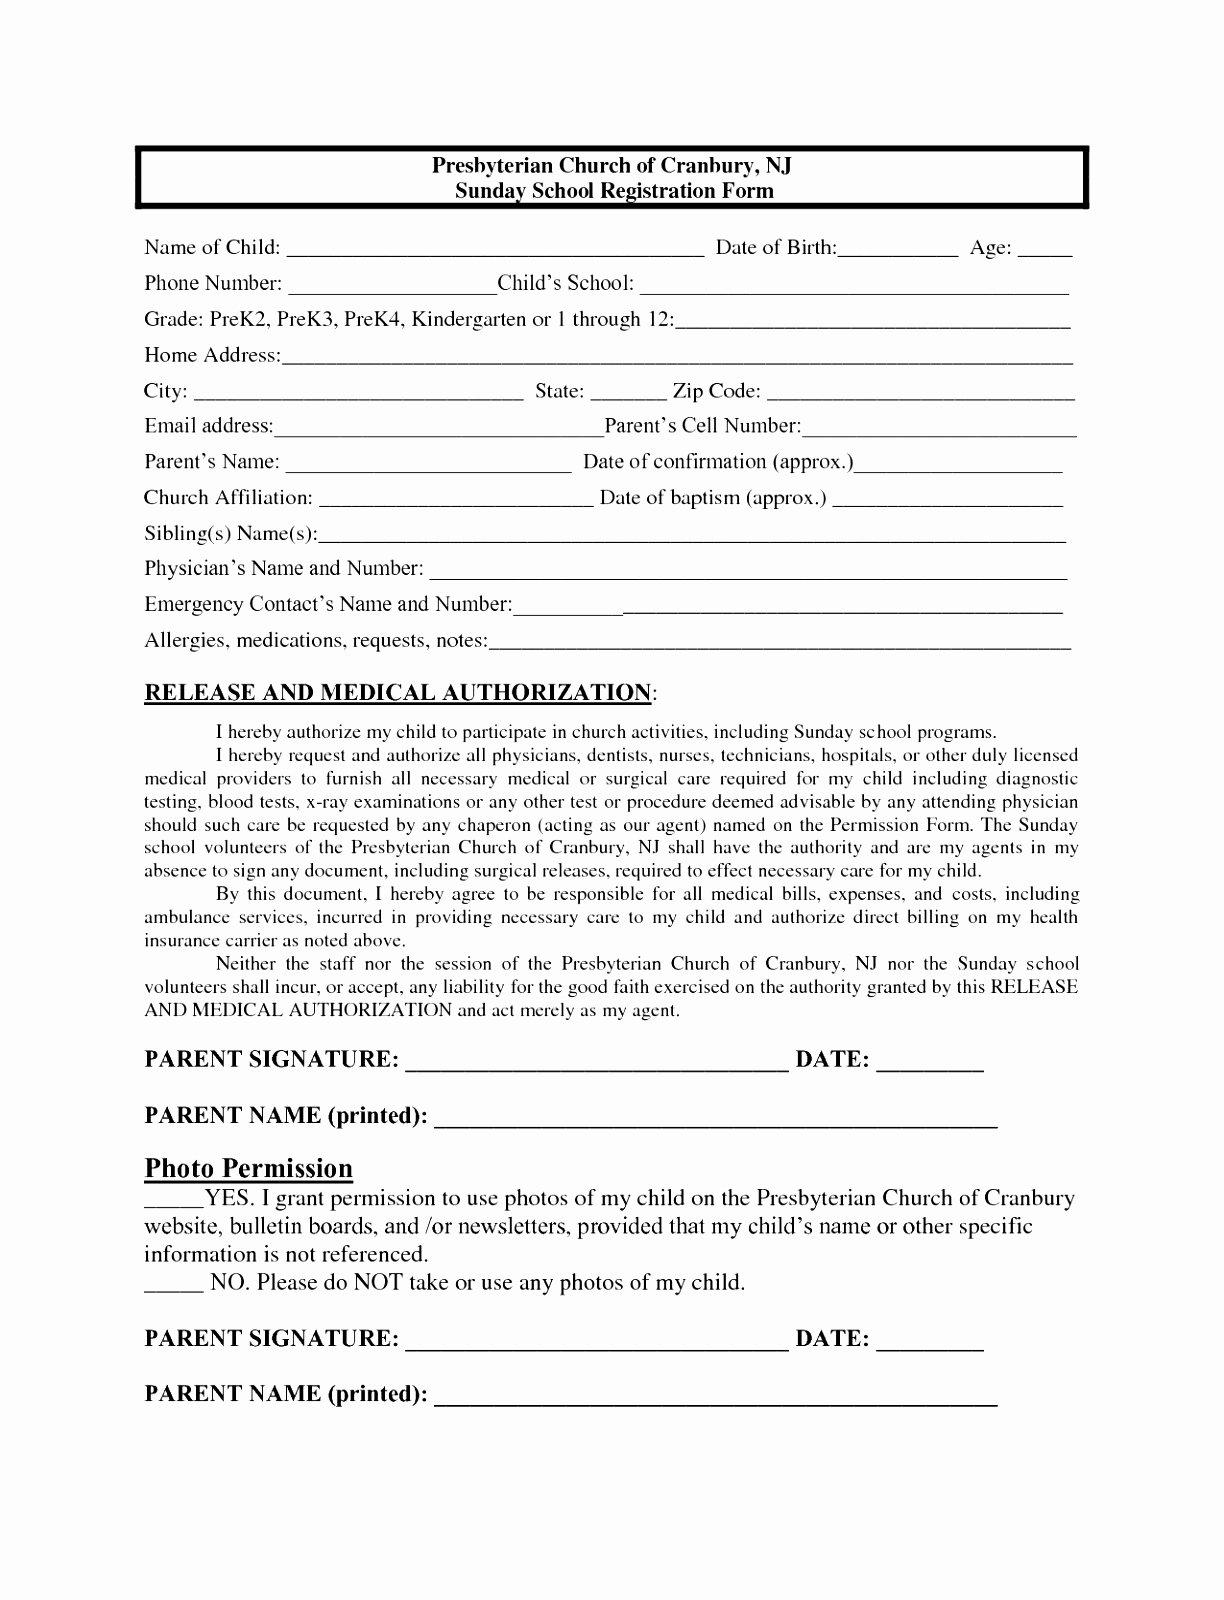 School Registration form Template Elegant 7 Sunday School Registration form Template Cutei